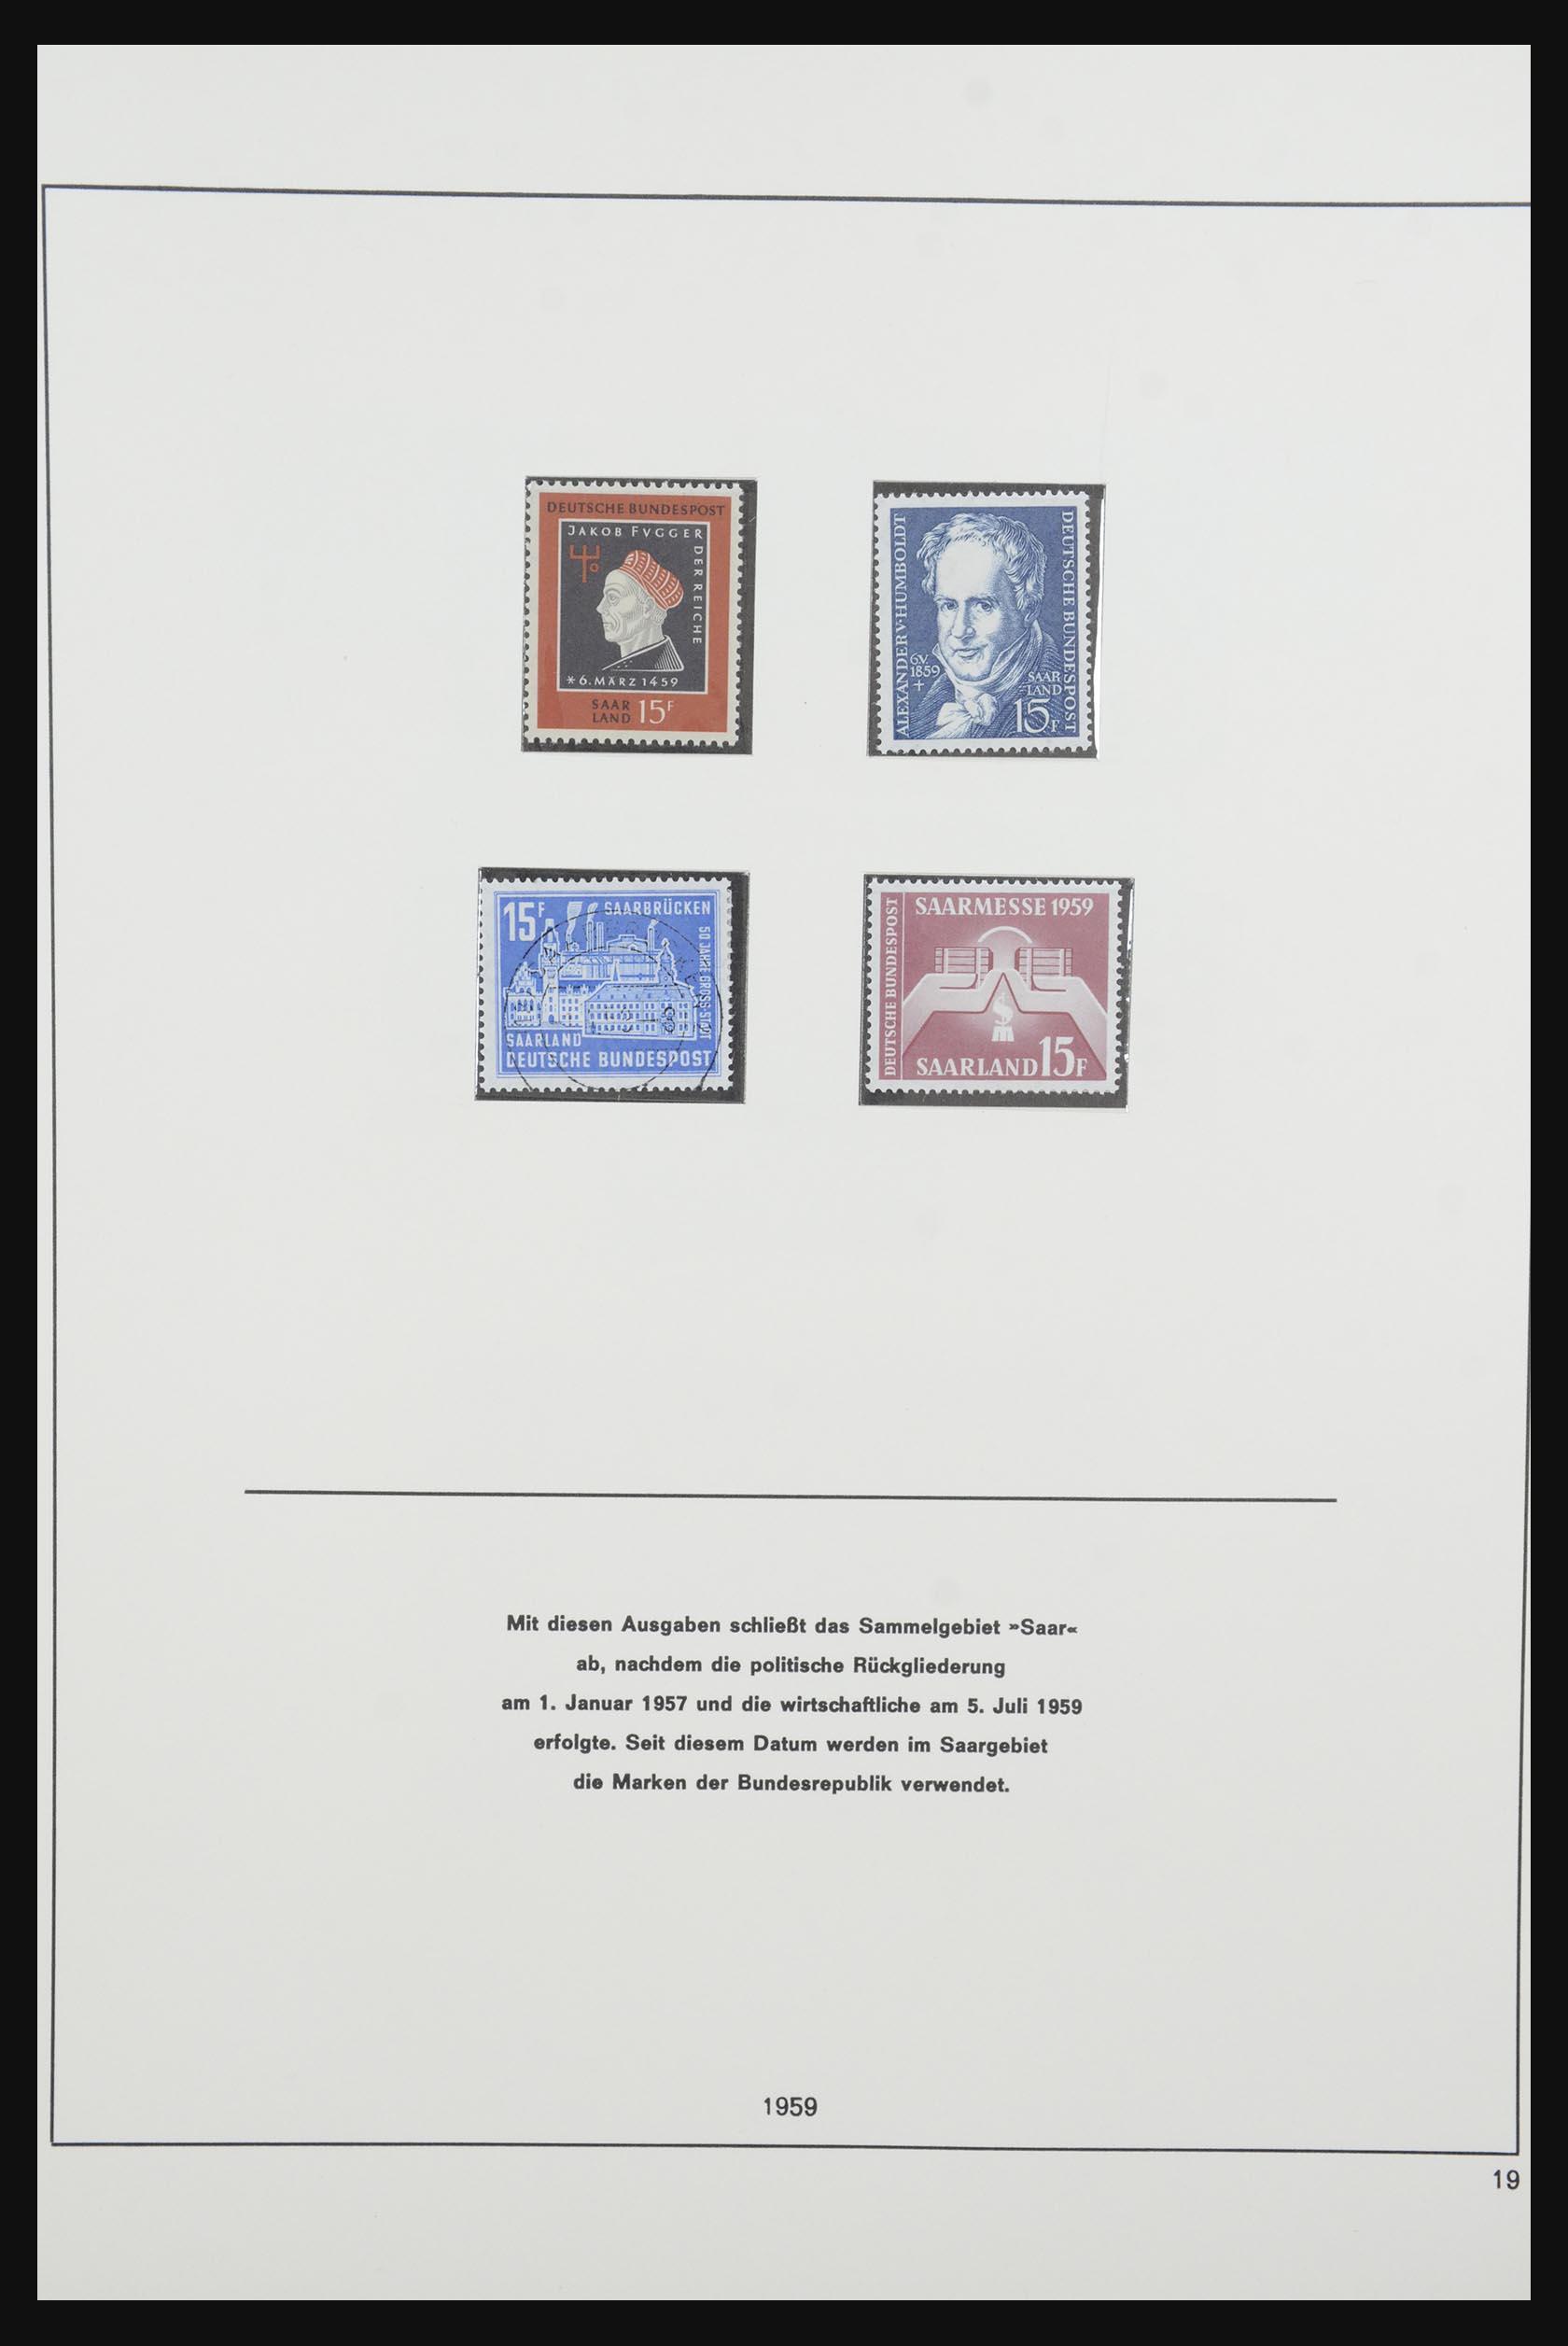 32014 019 - 32014 Germany 1945-1959.